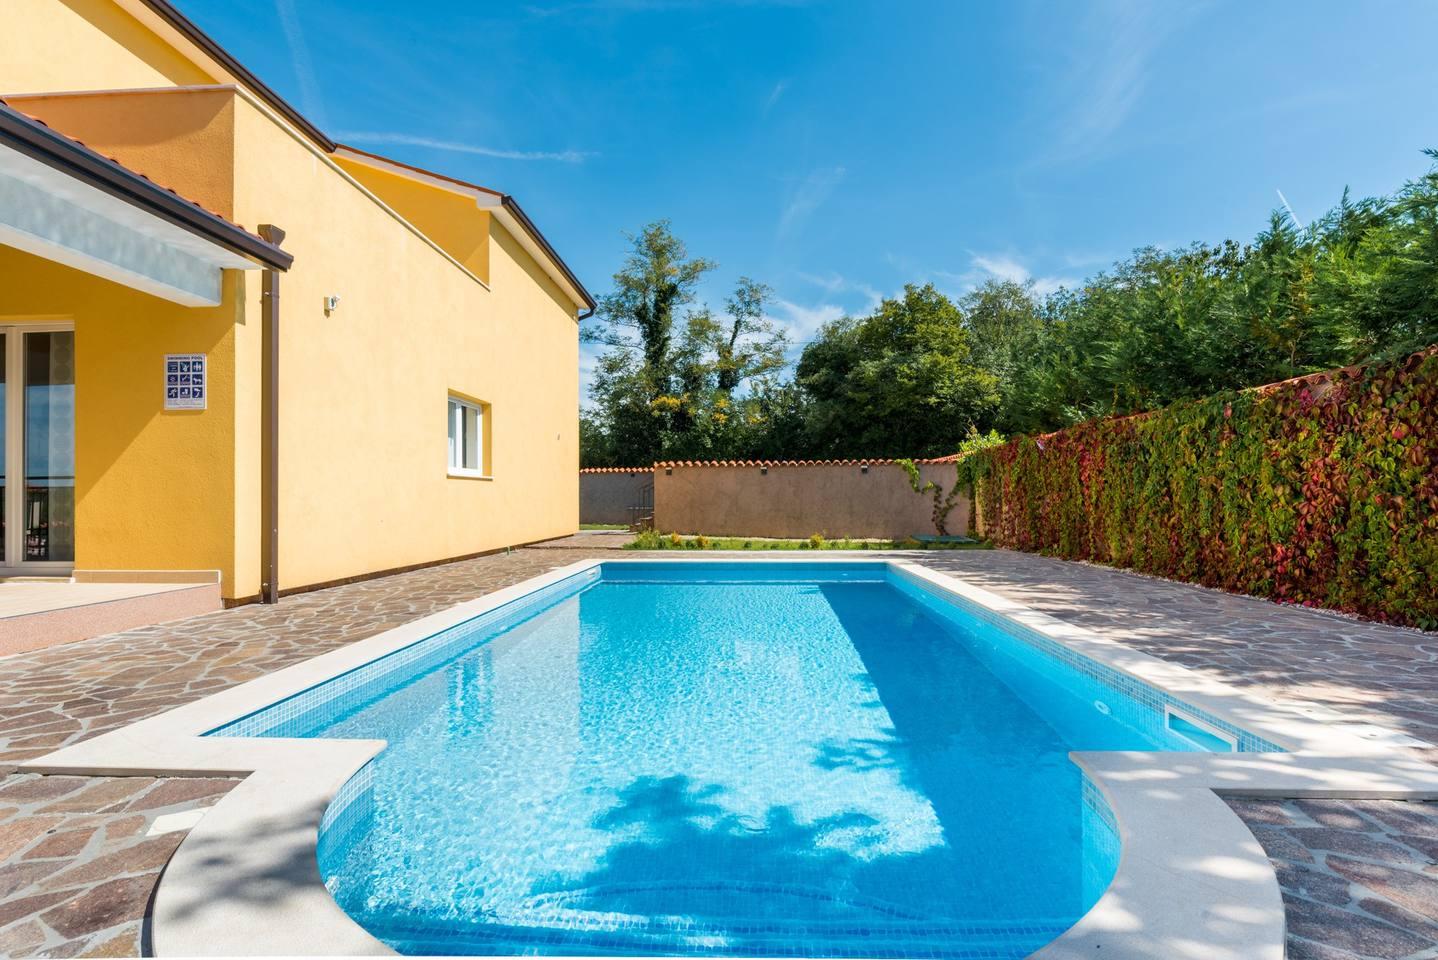 Villa in Zartinj photo 25615421